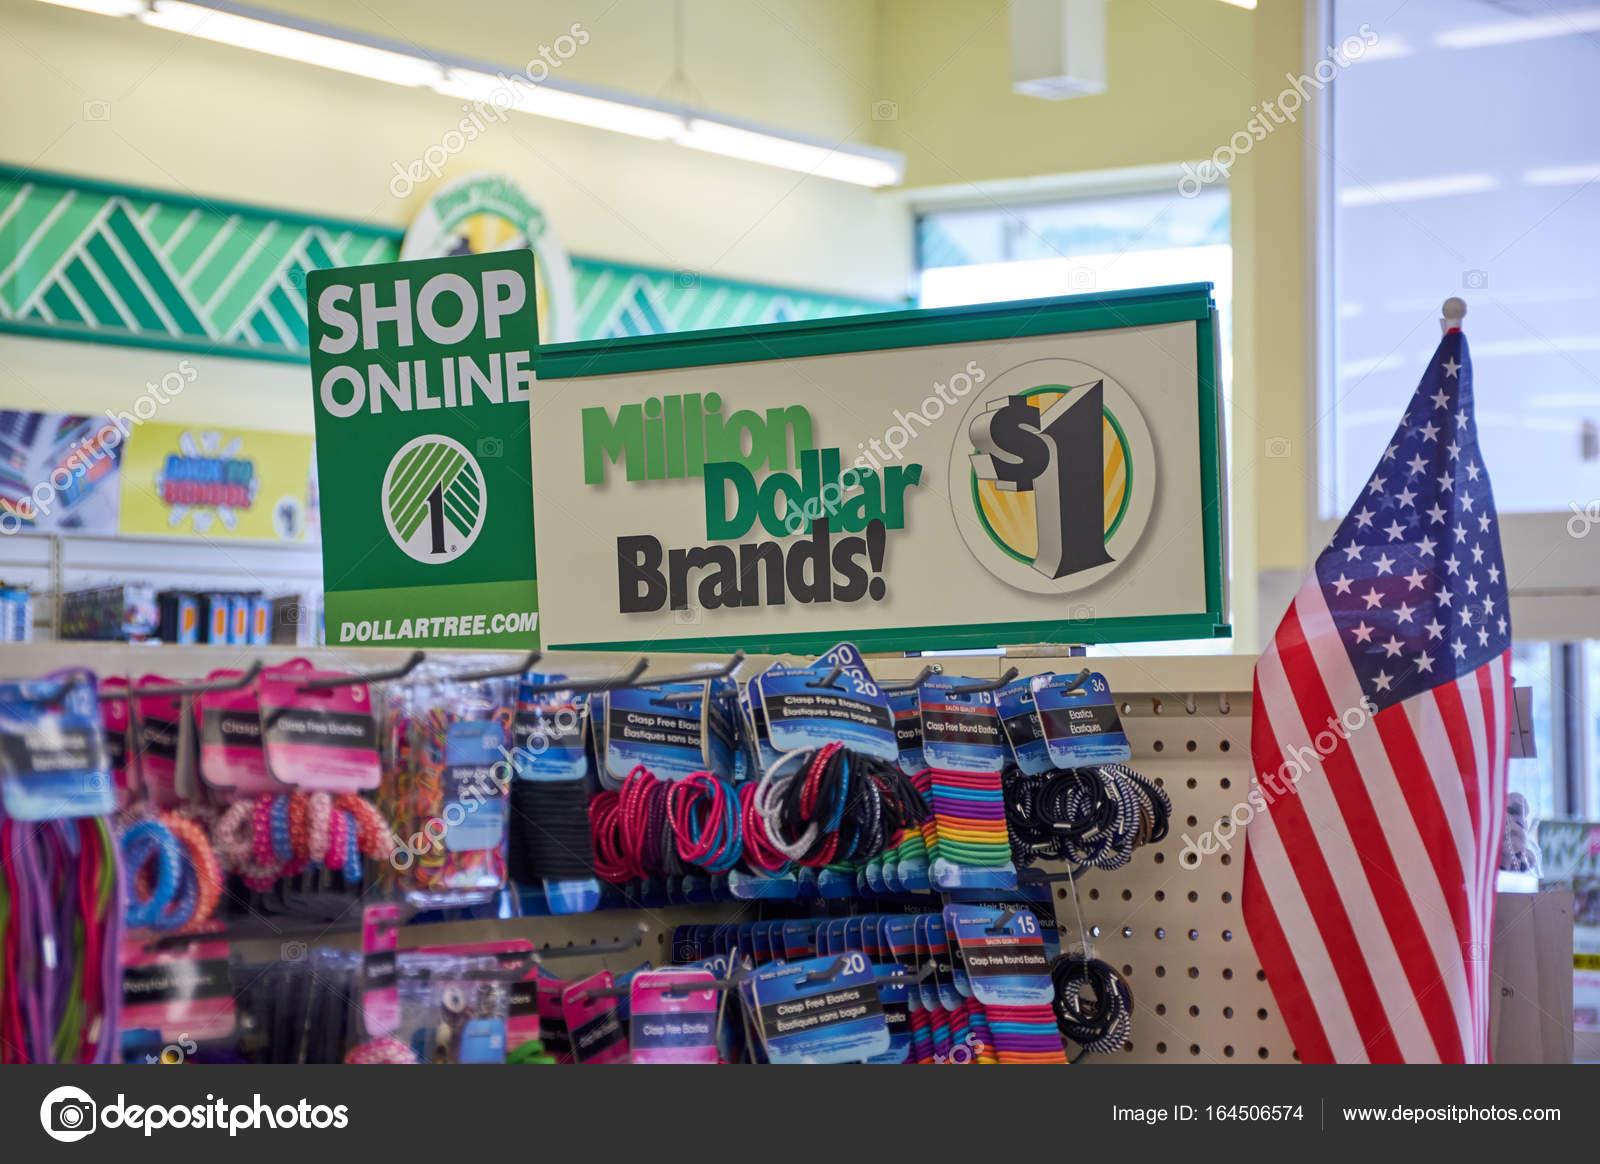 Dollar Tree shop online signage  – Stock Editorial Photo